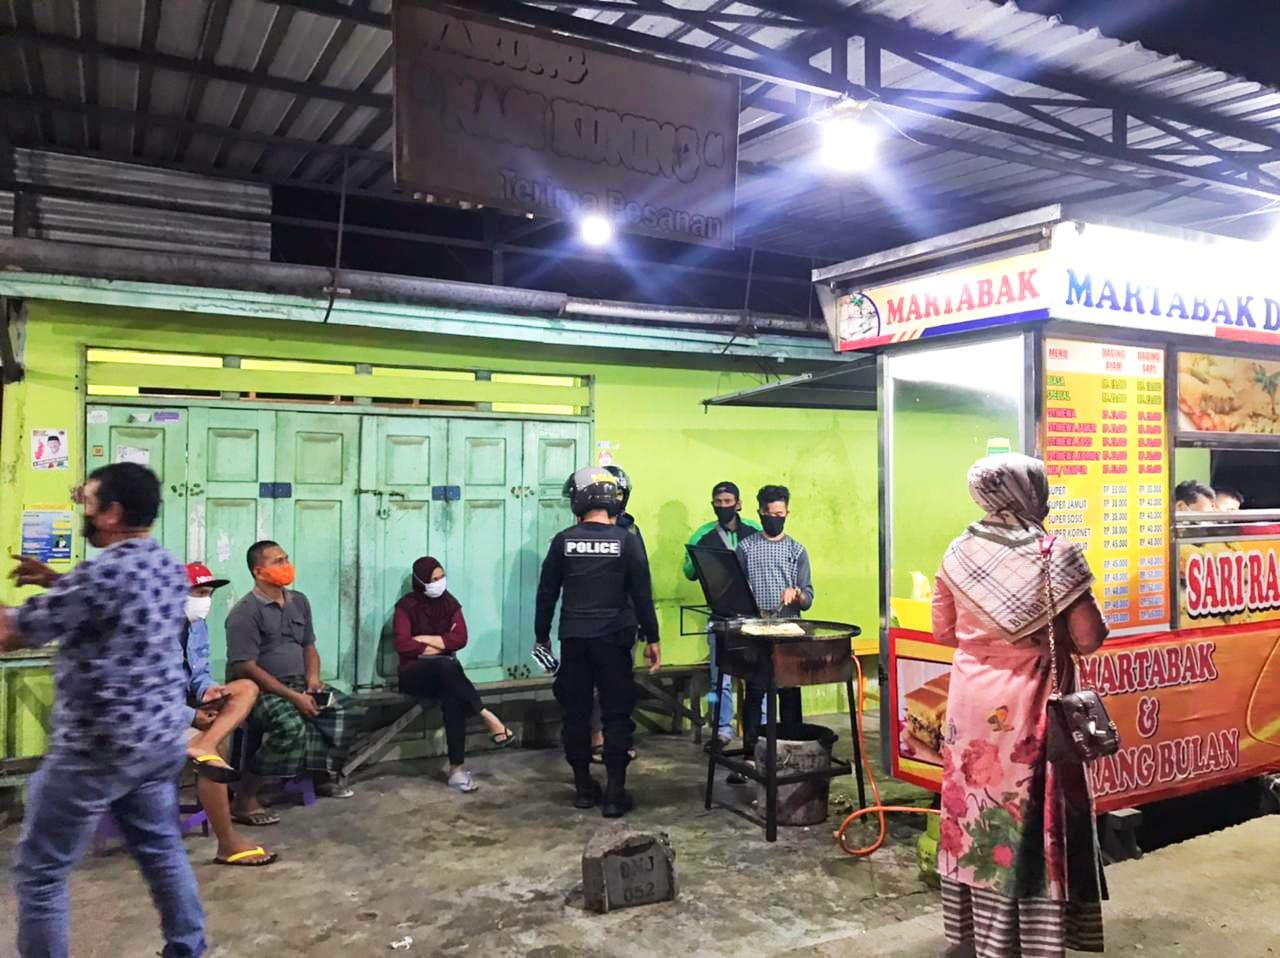 Personil Polresta Mamuju Patroli Malam Mobile system